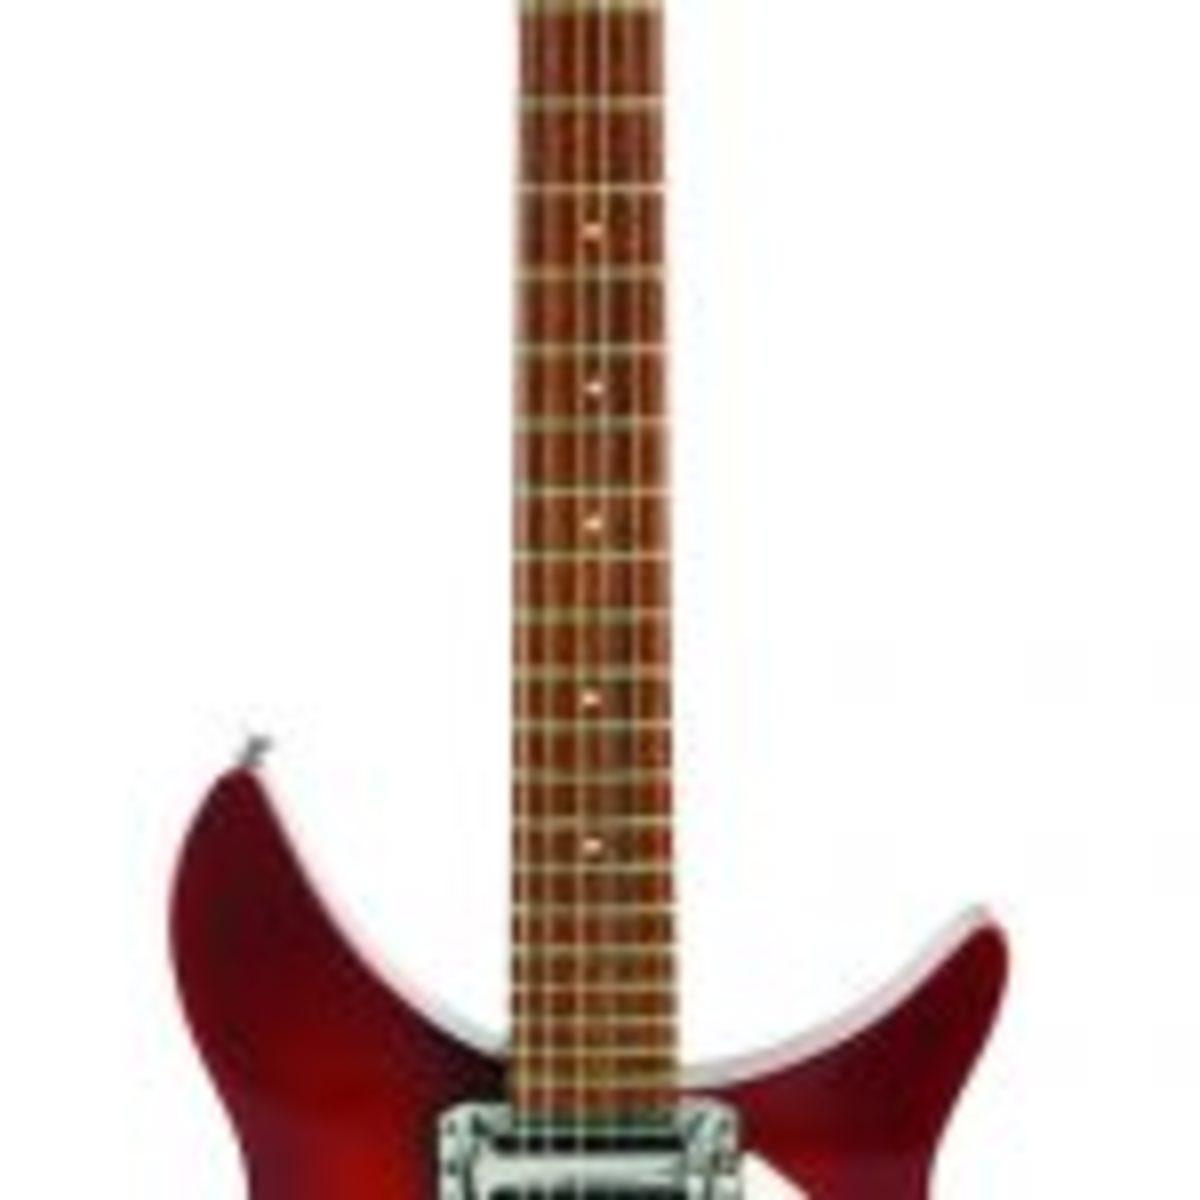 """The Beatle Backer"" guitar"